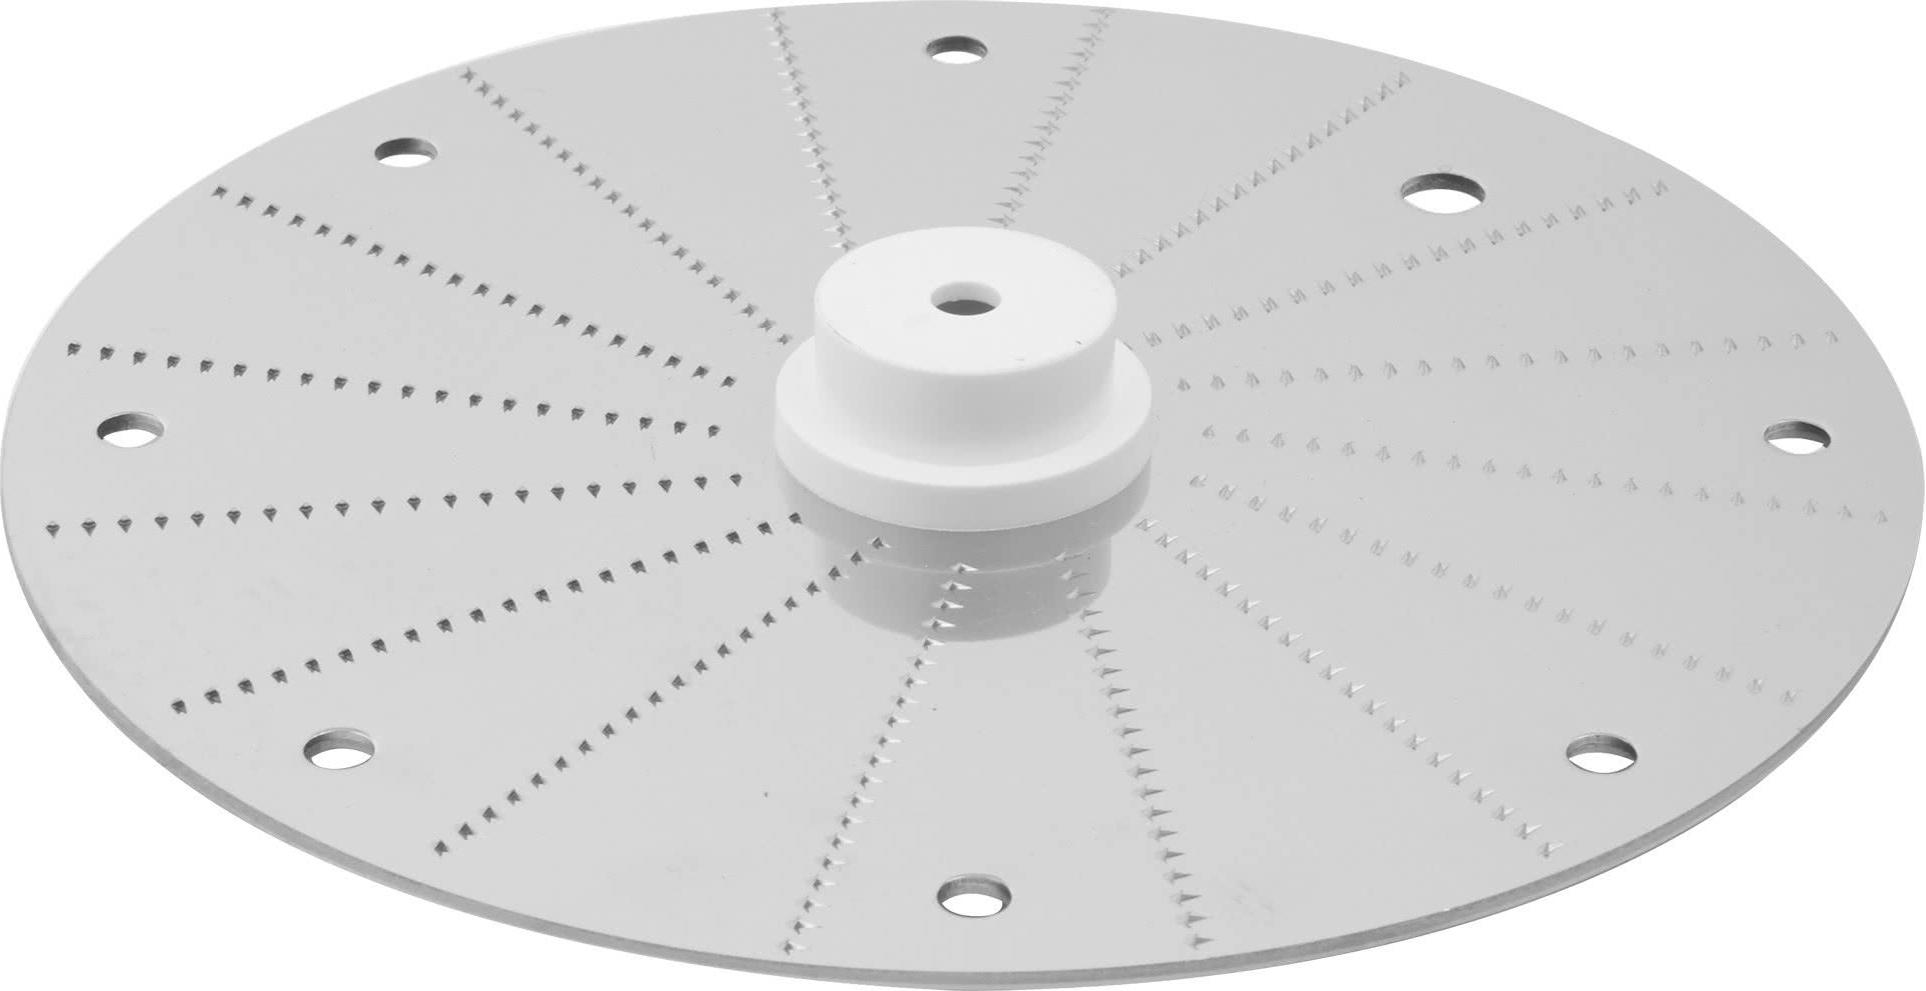 Диск-тёрка Robot Coupe 27079 (1 мм) для редьки и хрена - 2